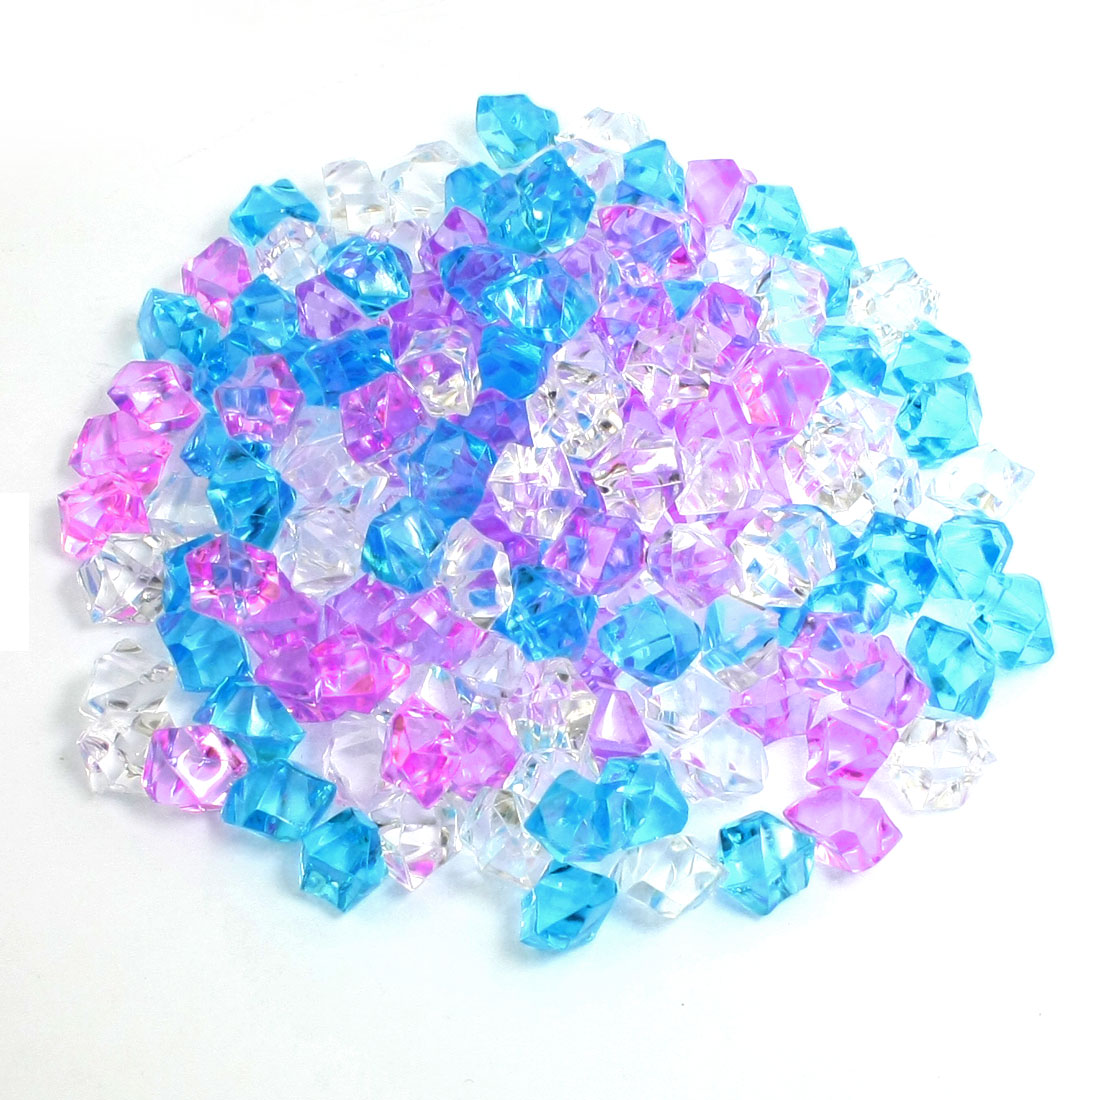 150Pcs Blue Pink White Plastic Beads Aquarium Ornament Crystal Stone